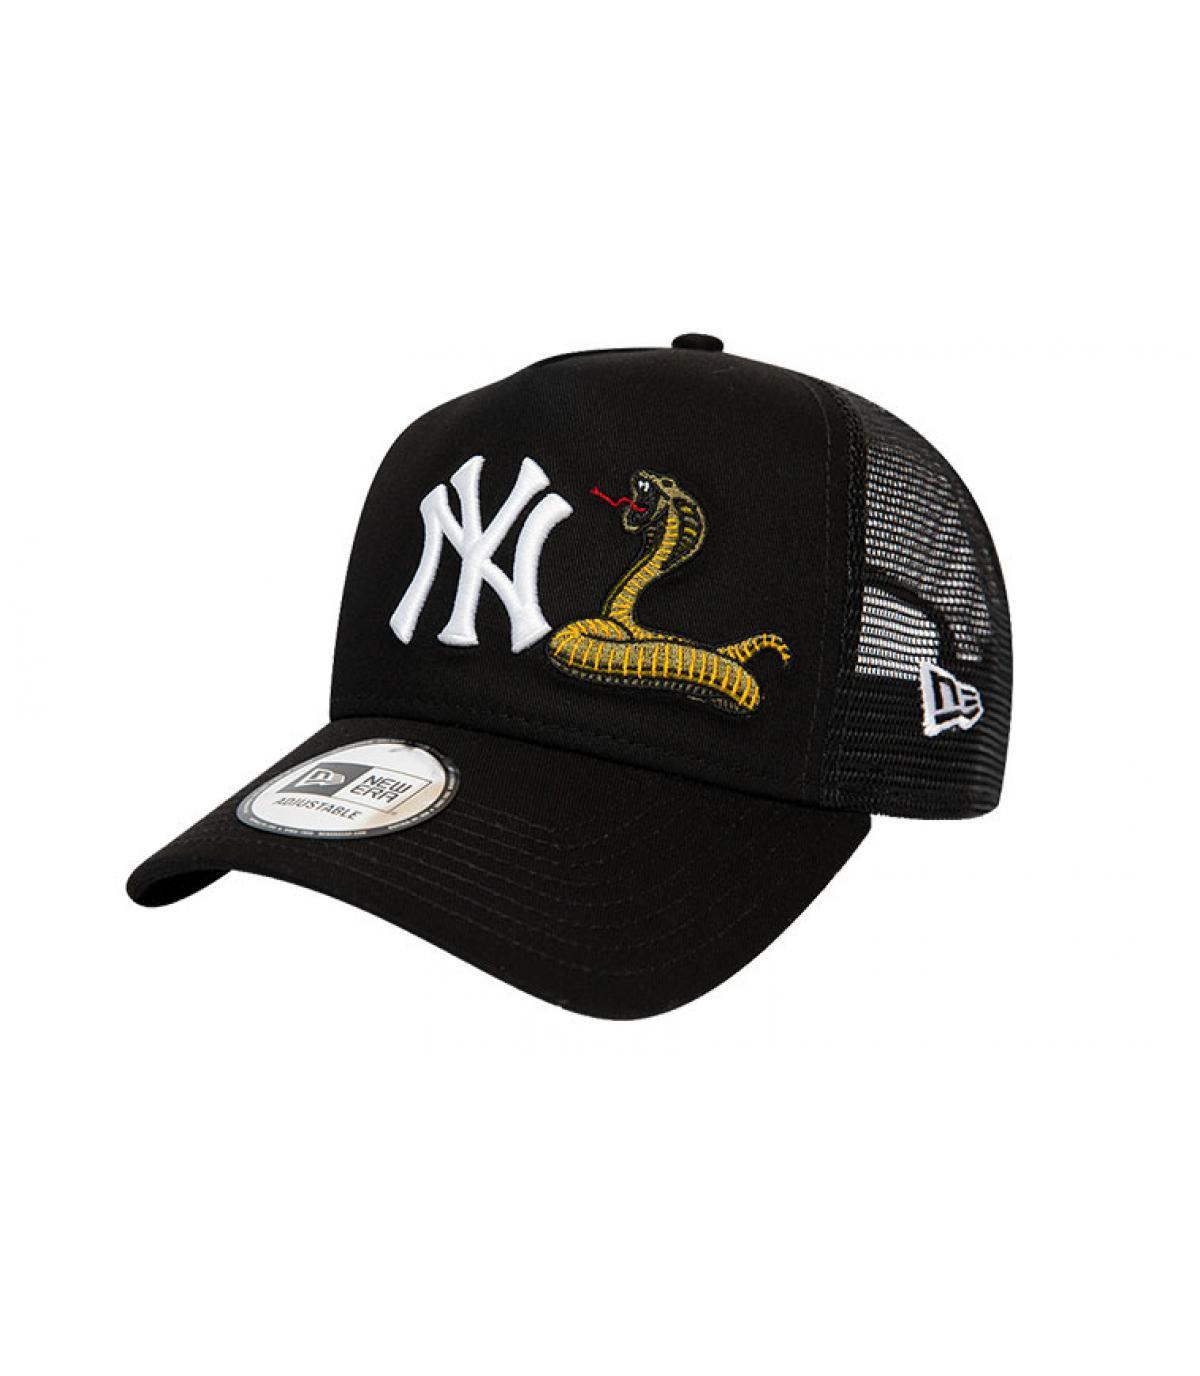 Details Trucker MLB Twine NY black - afbeeling 2